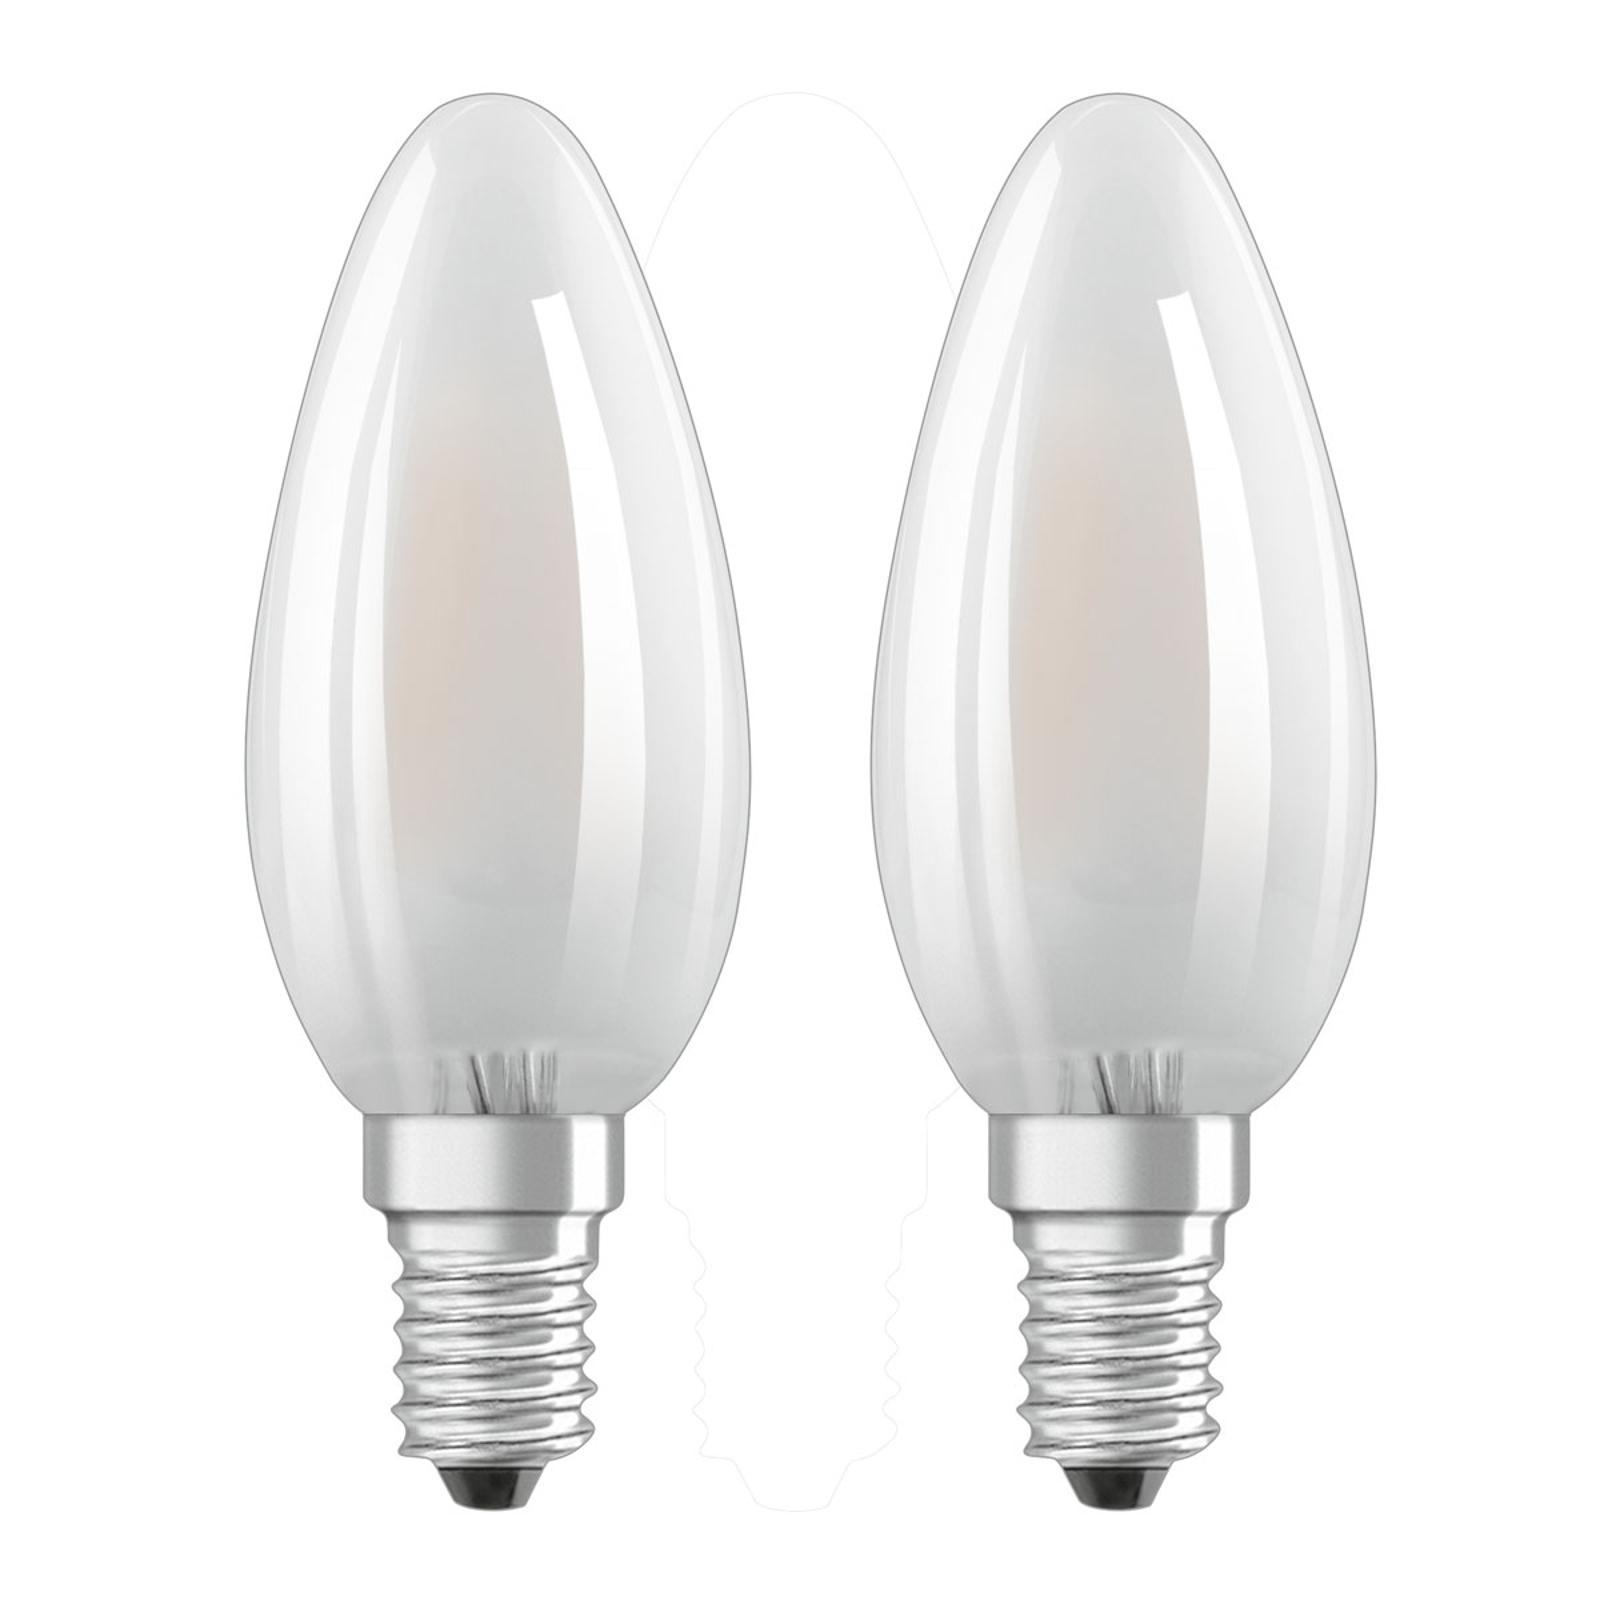 OSRAM LED-Kerzenlampe E14 4W warmweiß im 2er-Set